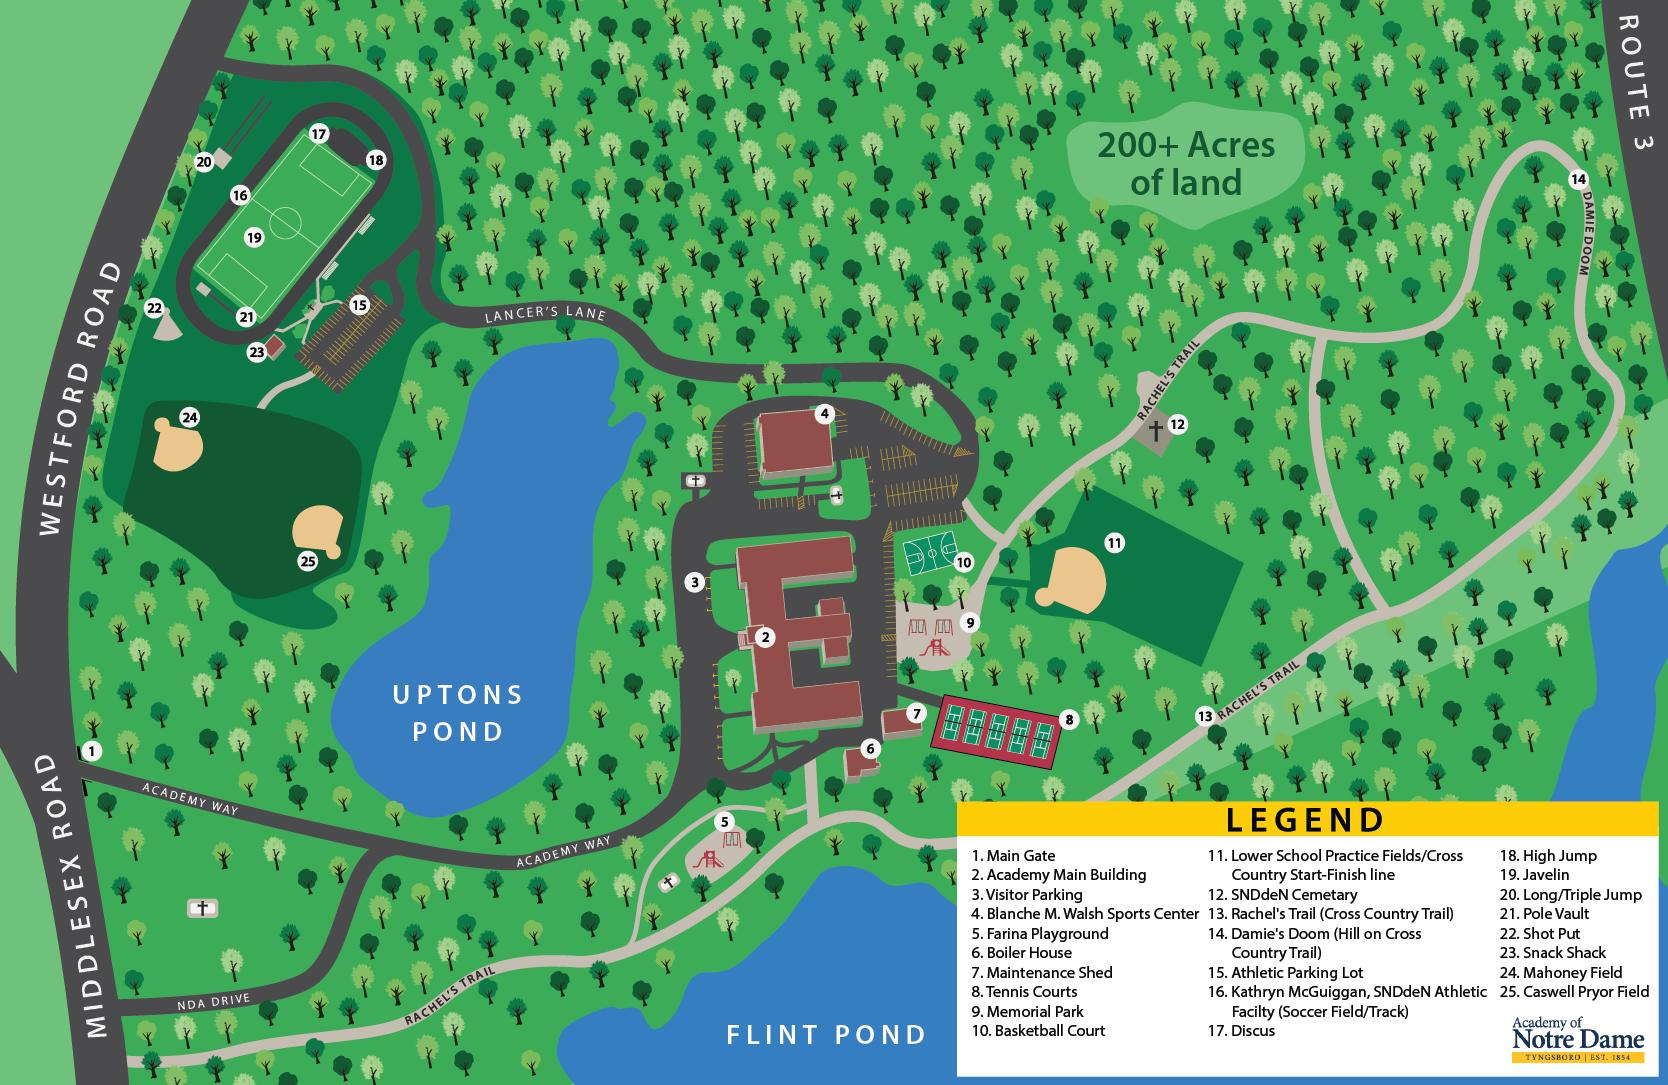 Inset map of campus